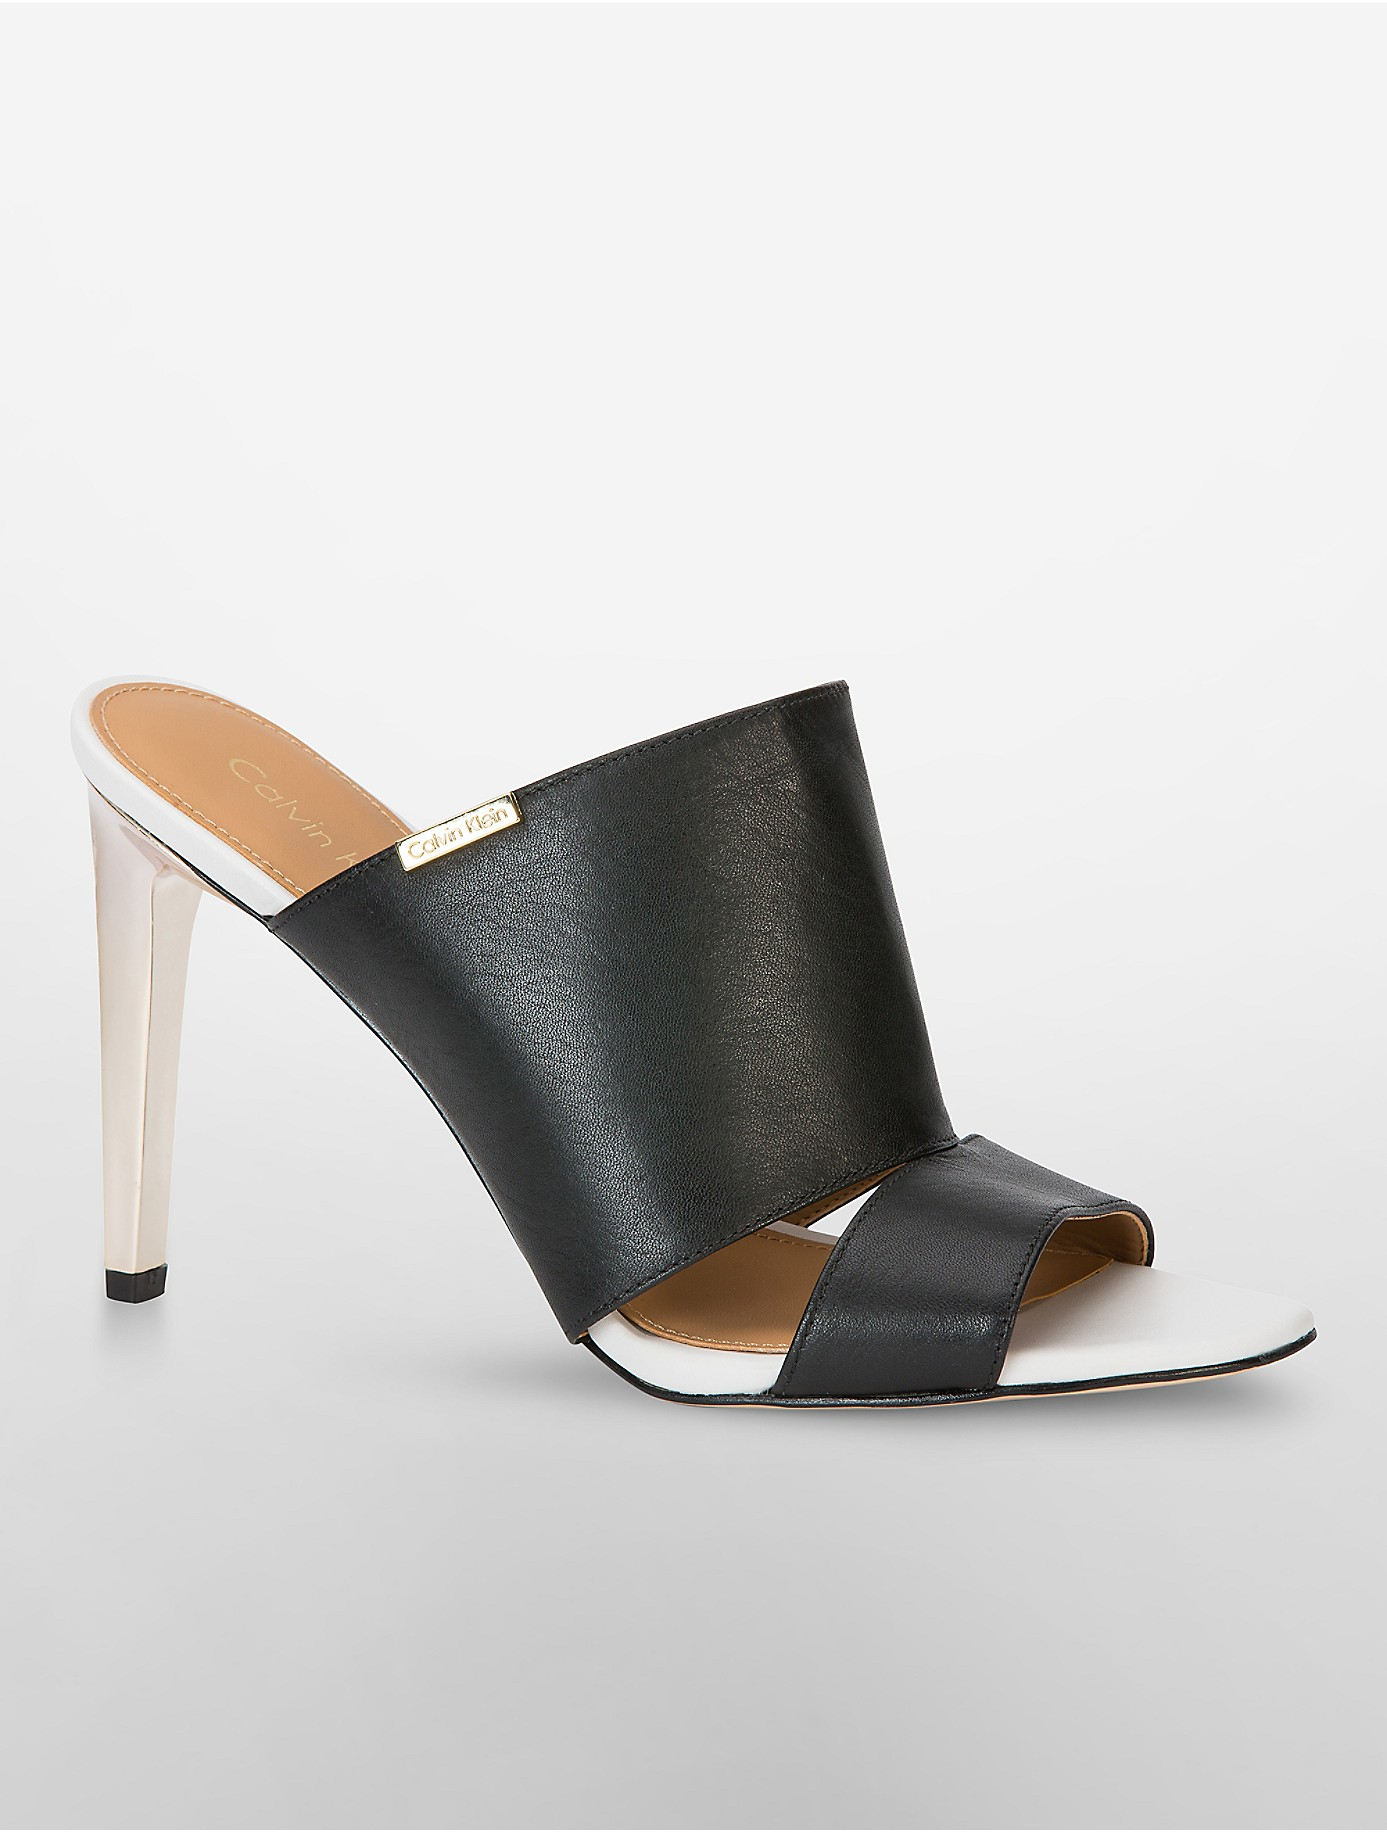 6c9d7b4e4db8 Lyst - Calvin Klein Ninfa Mule in Black